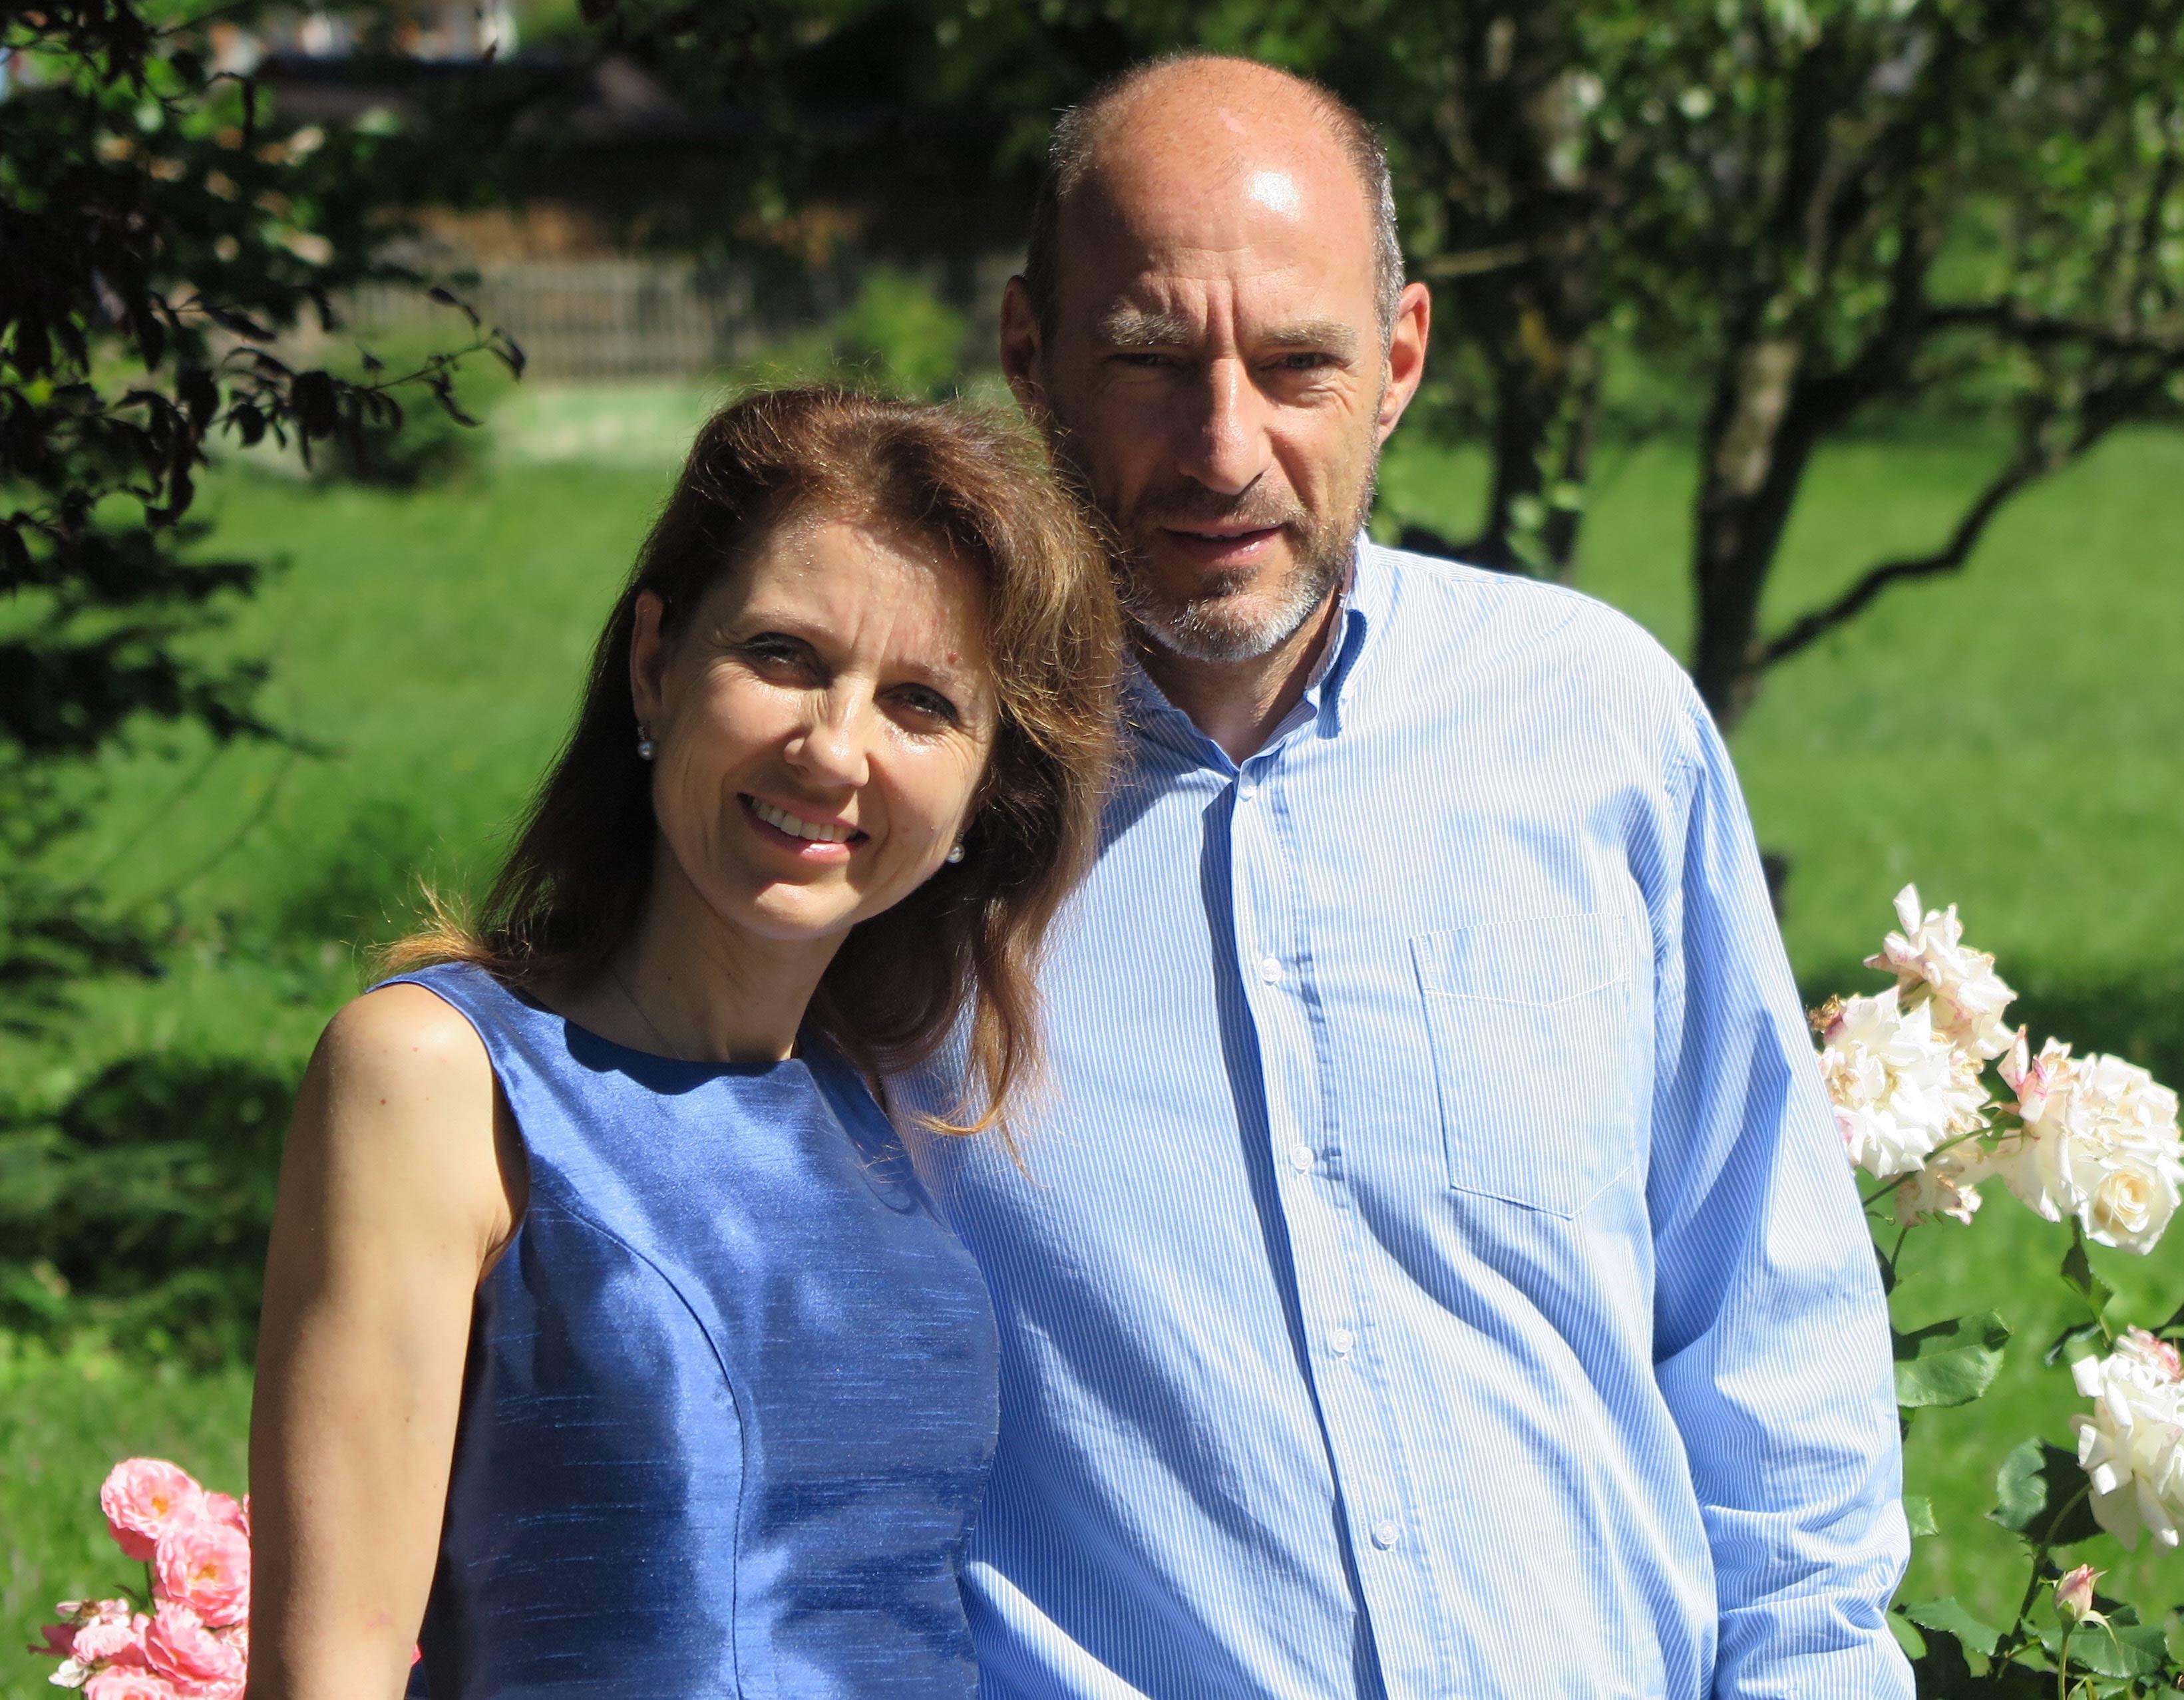 Cinq questions à Francesca Mottes, directrice de l'Alp & Wellness Sport Hotel Panorama